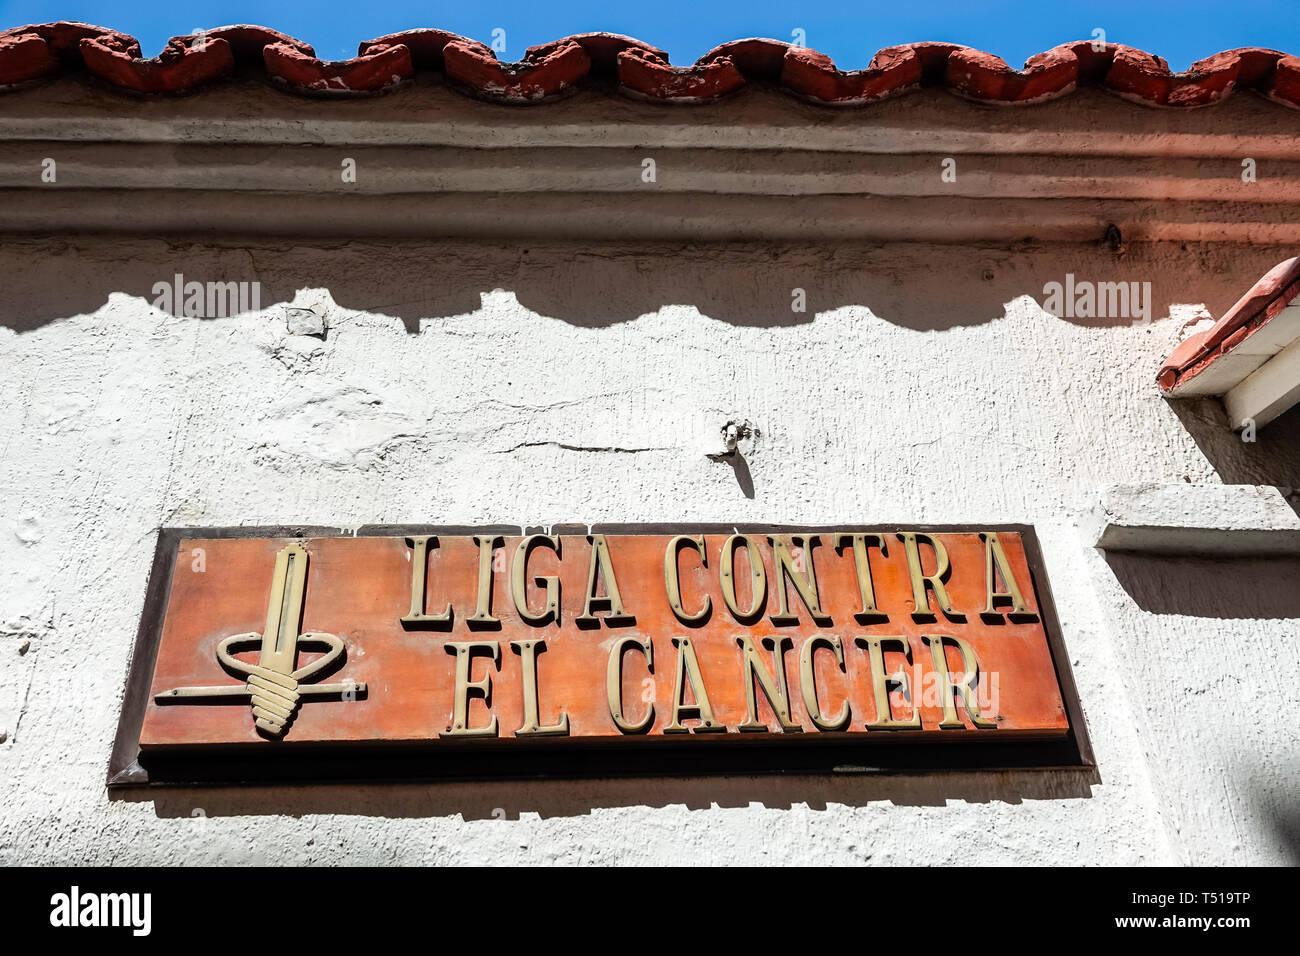 Cartagena Colombia Old Walled City Center centre Centro Liga Contra El Cancer anti-cancer league nonprofit sign - Stock Image